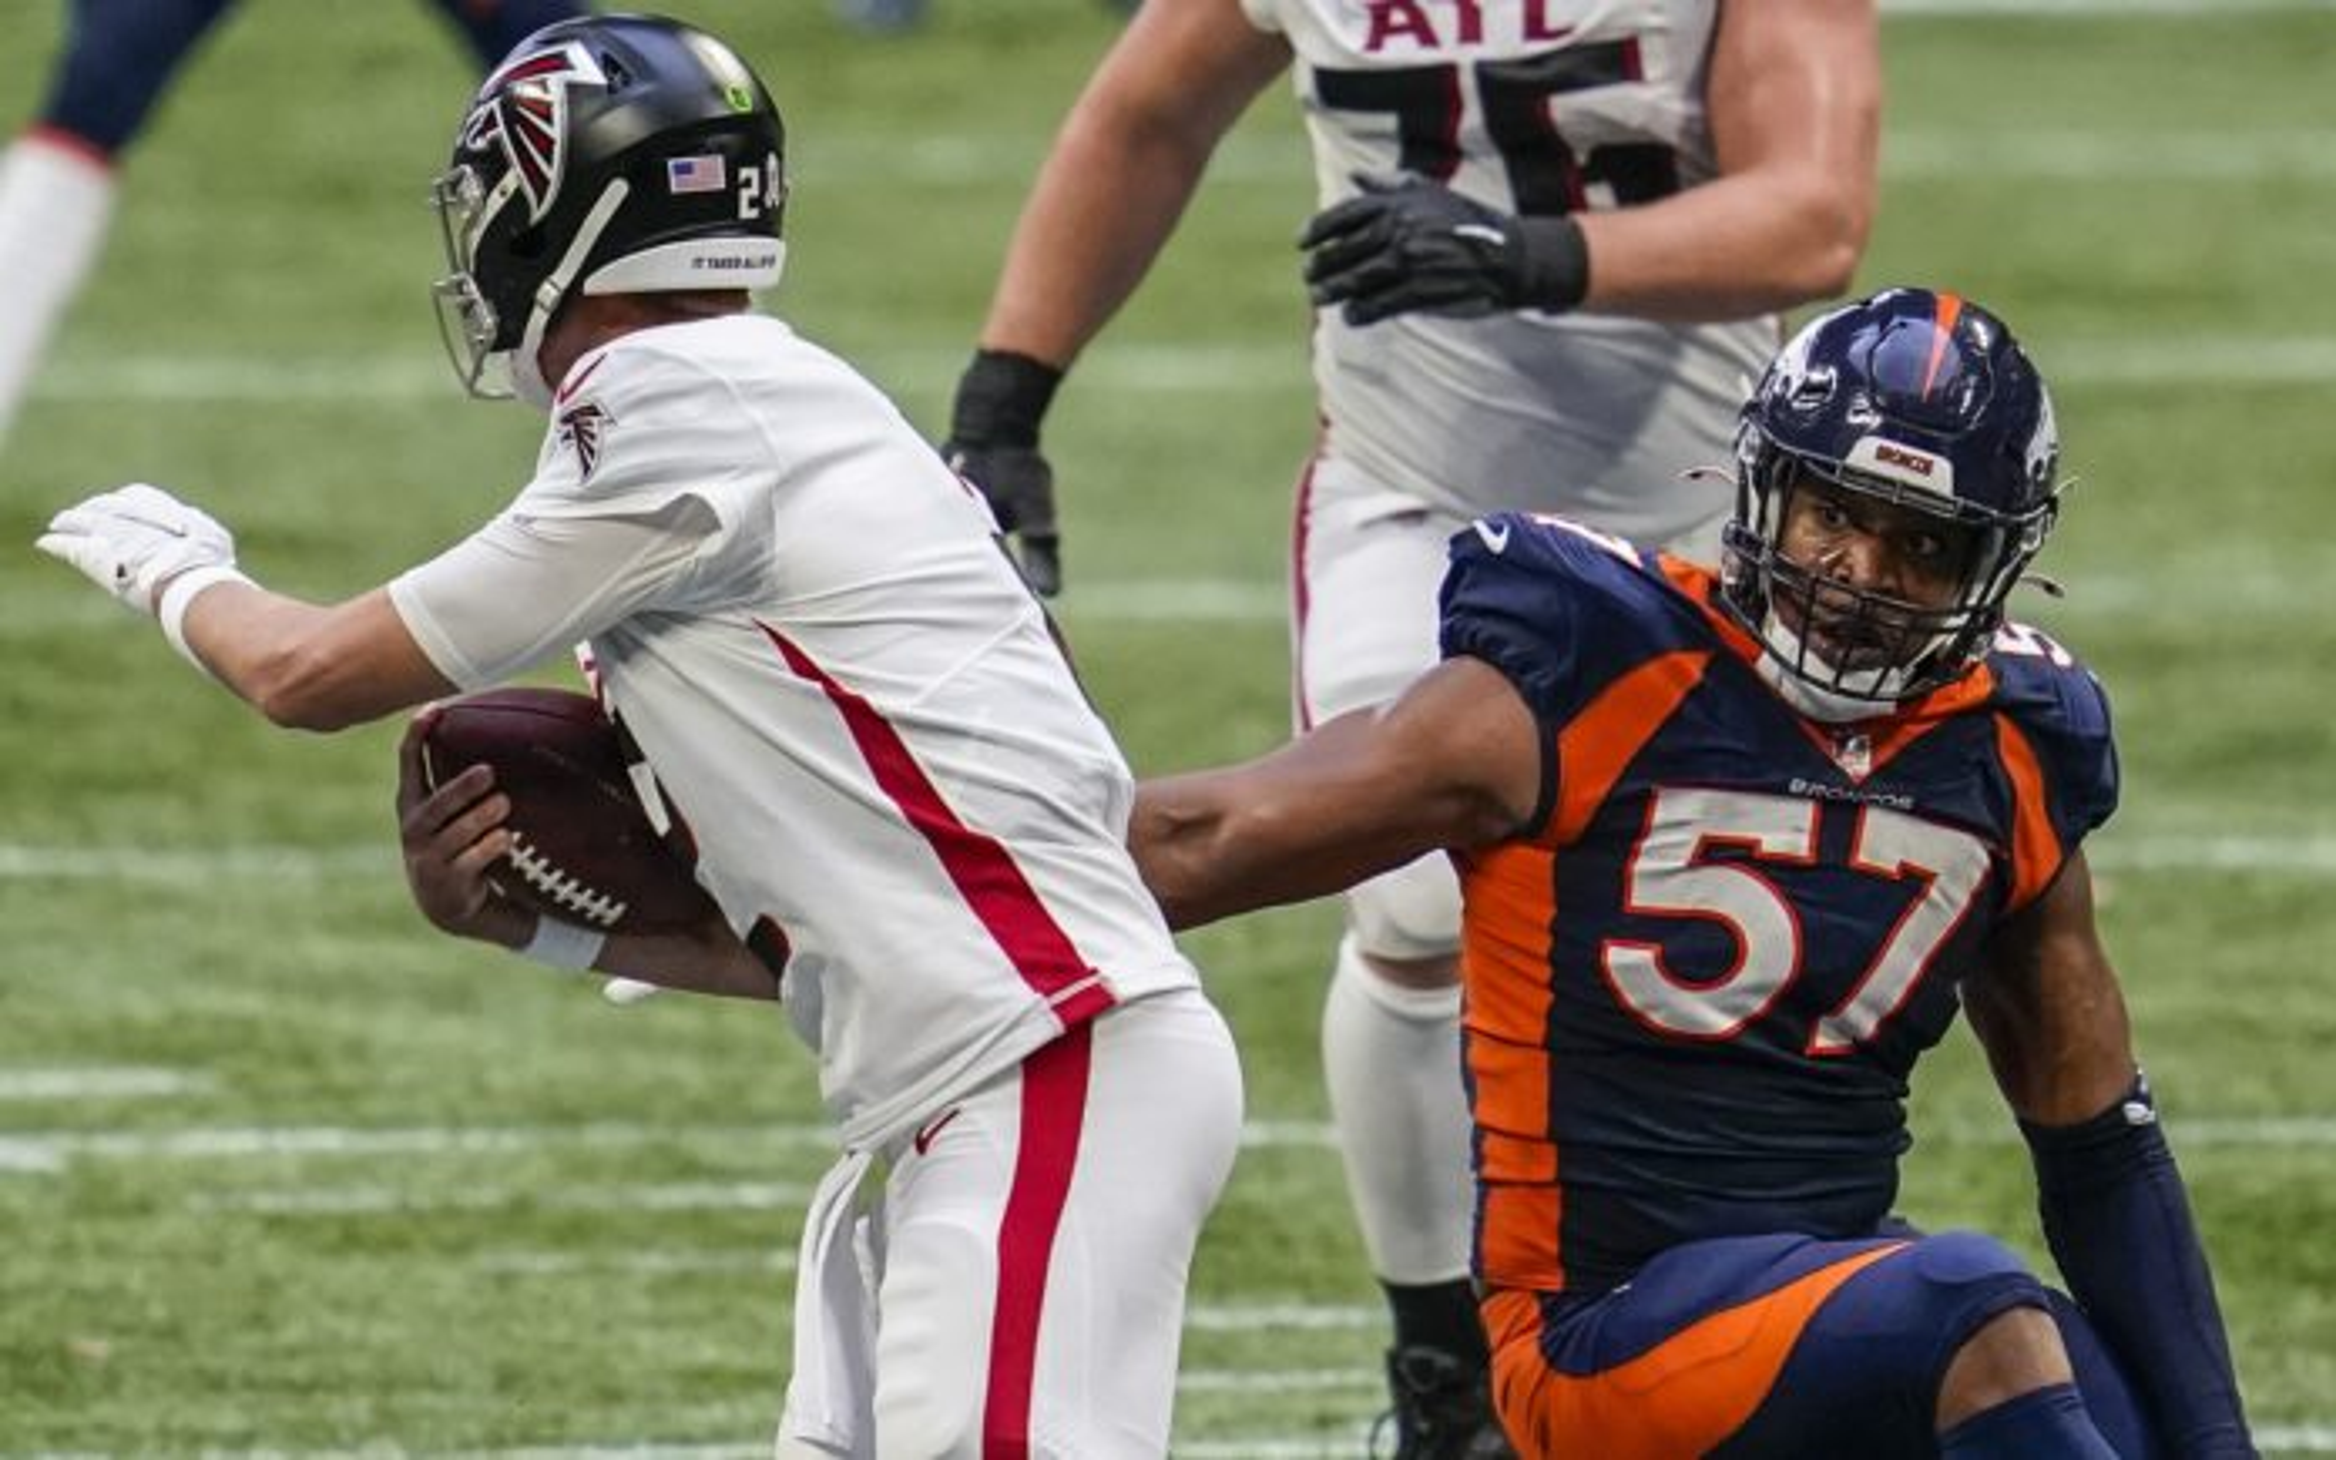 DeMarcus Walker misses a tackle on Matt Ryan. Credit: Dale Zanine, USA TODAY Sports.